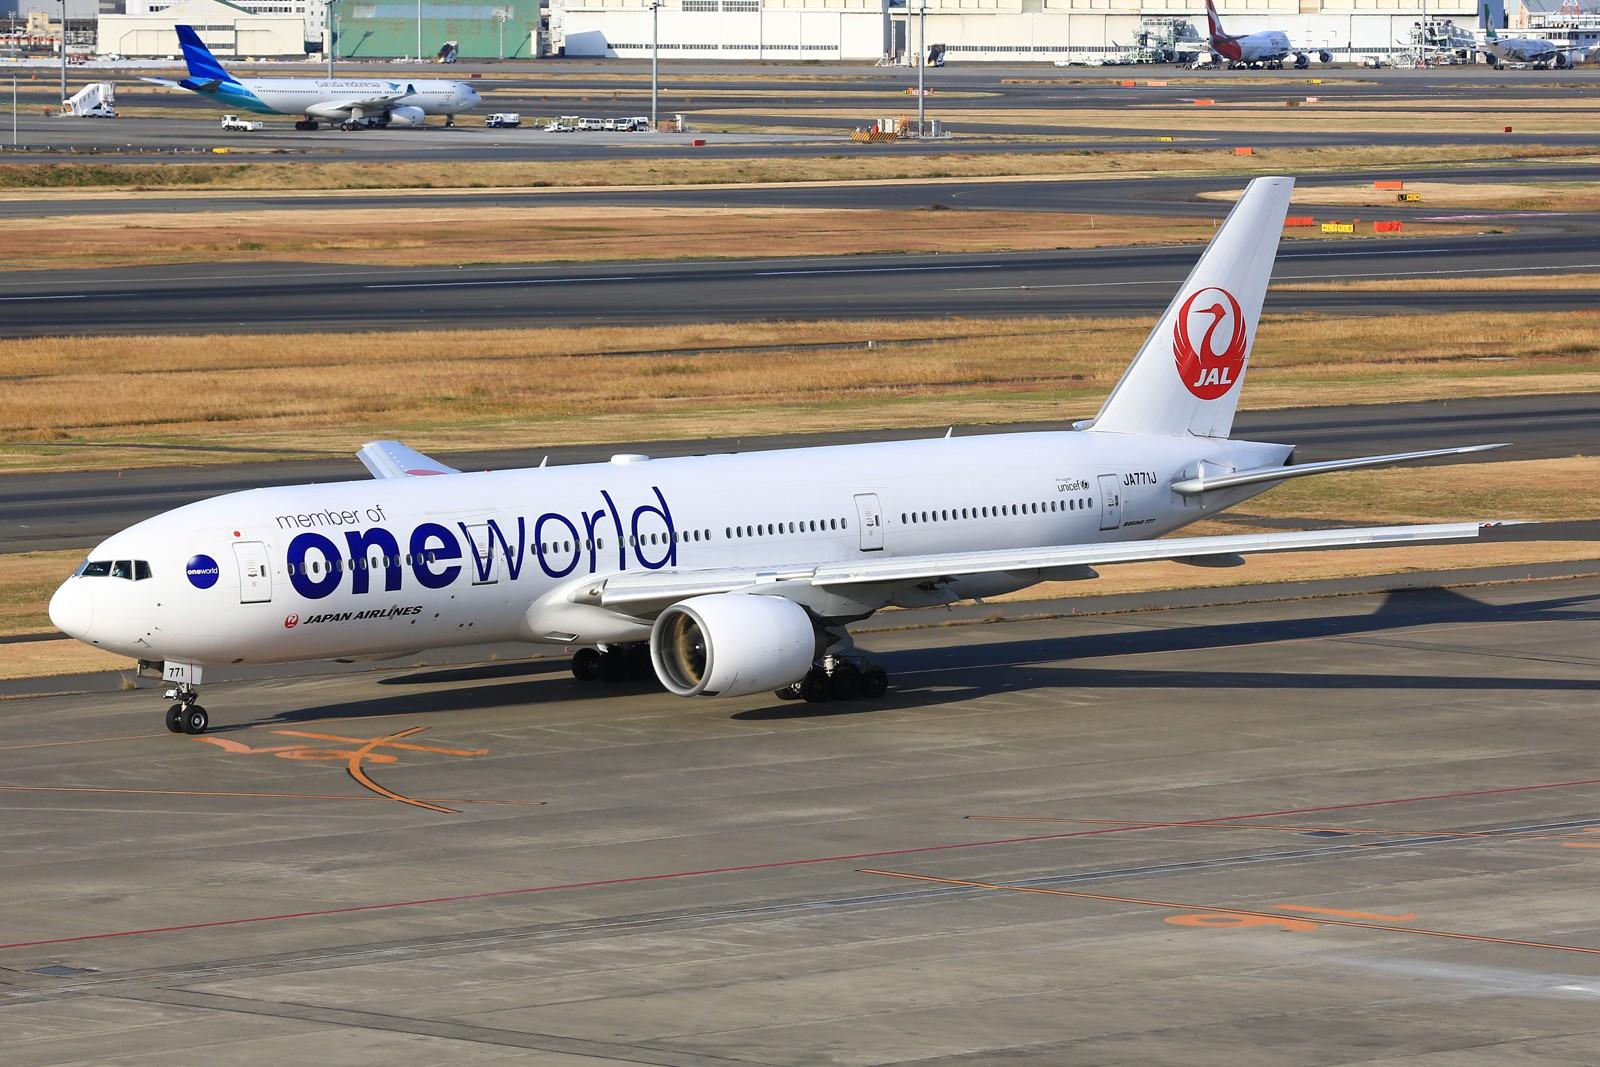 Re:[原创]【HND】******2016新年好,流窜羽田机场:全日空星战,汉莎1500th,以及一些大路货****** BOEING 777-200 JA771J 日本东京羽田国际机场